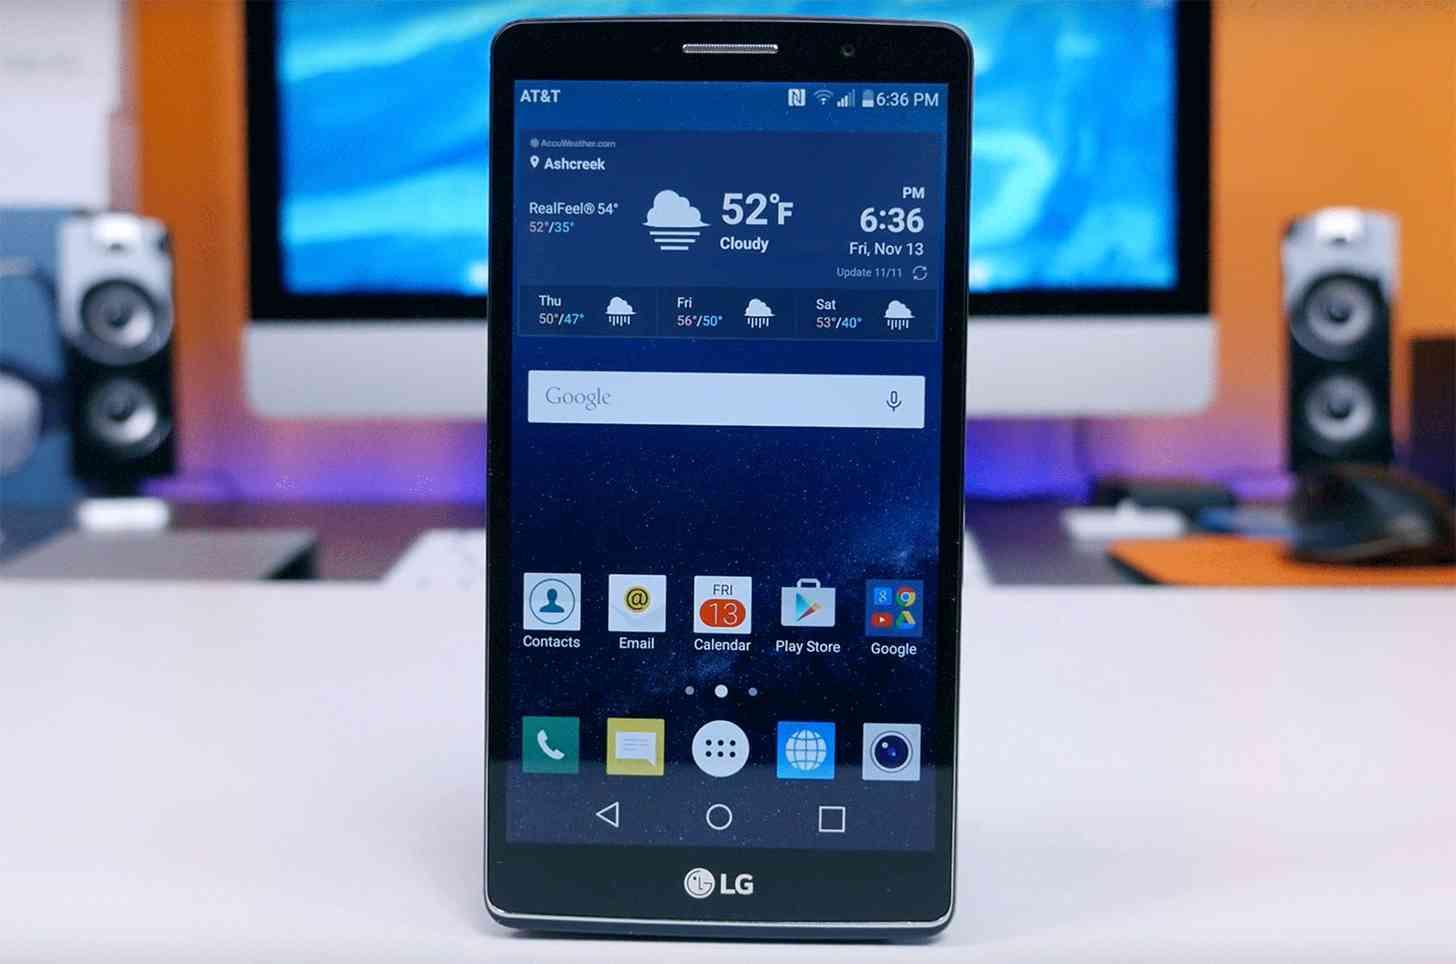 AT&T LG G Vista 2 unboxing